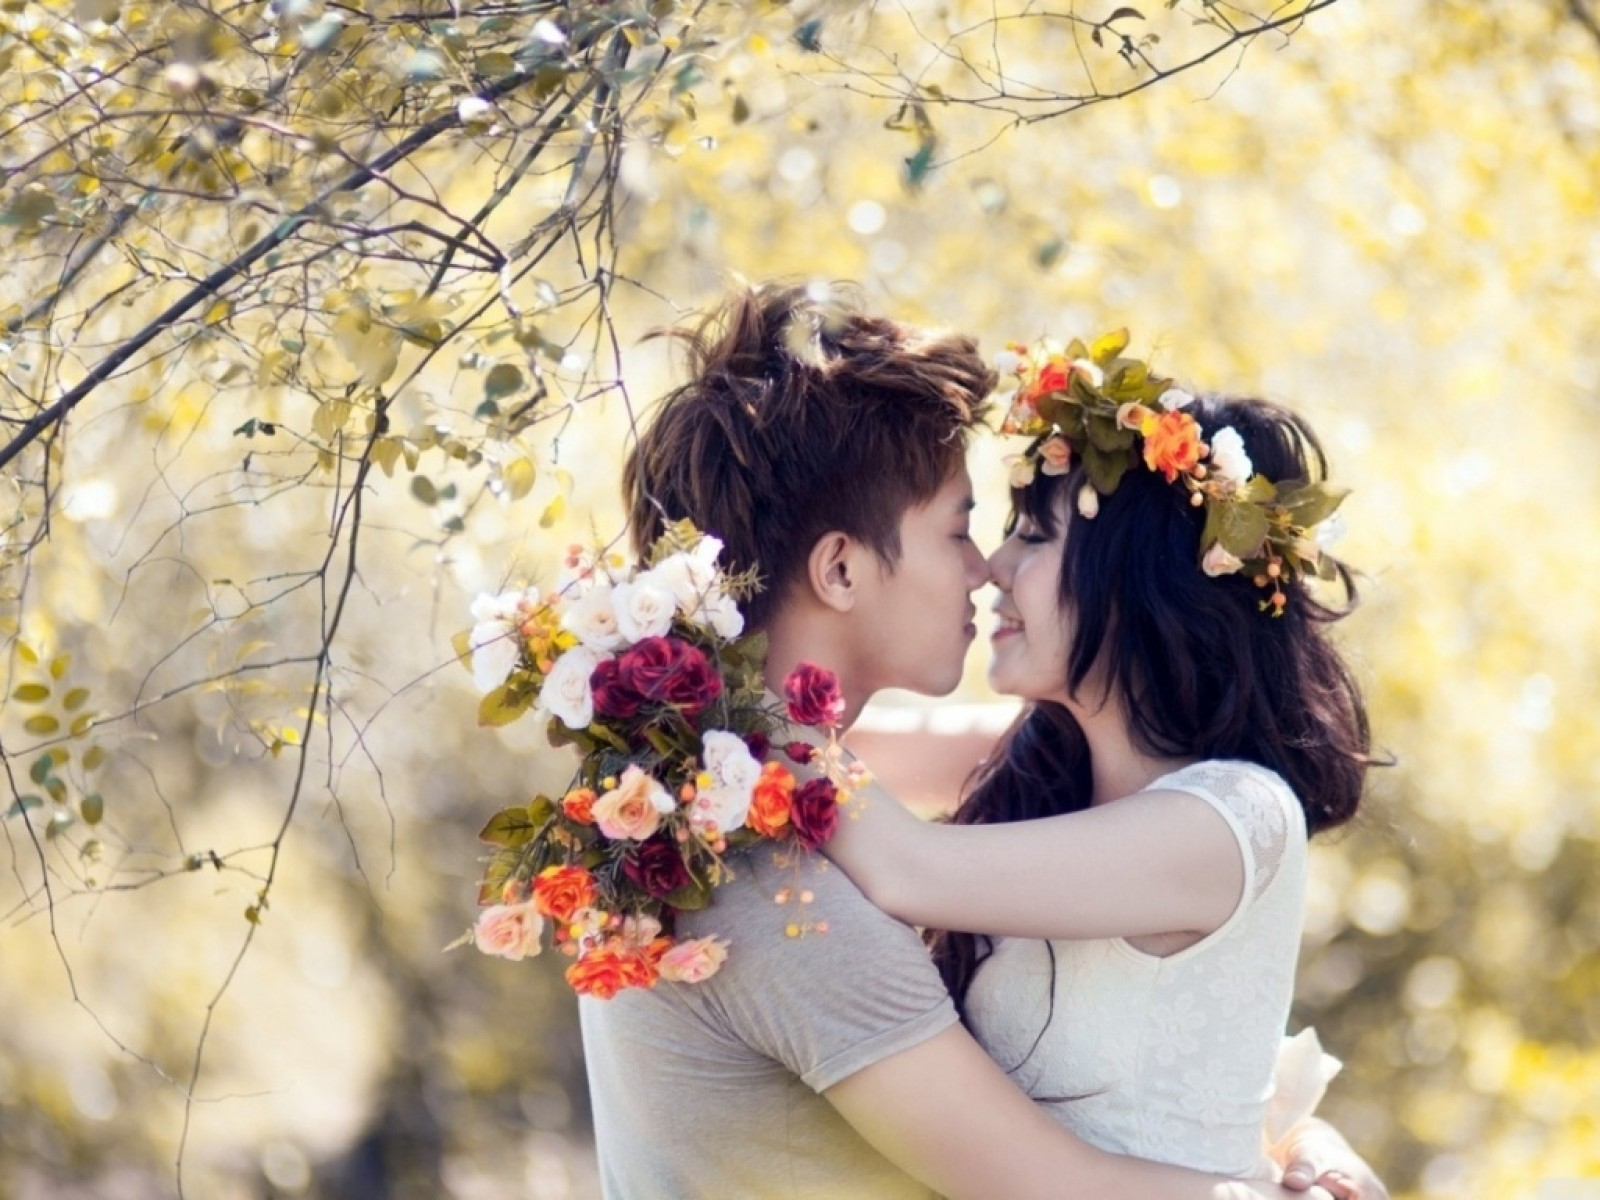 صورة صور حب رومنسي , اجمل صور حب رومنسى 690 6